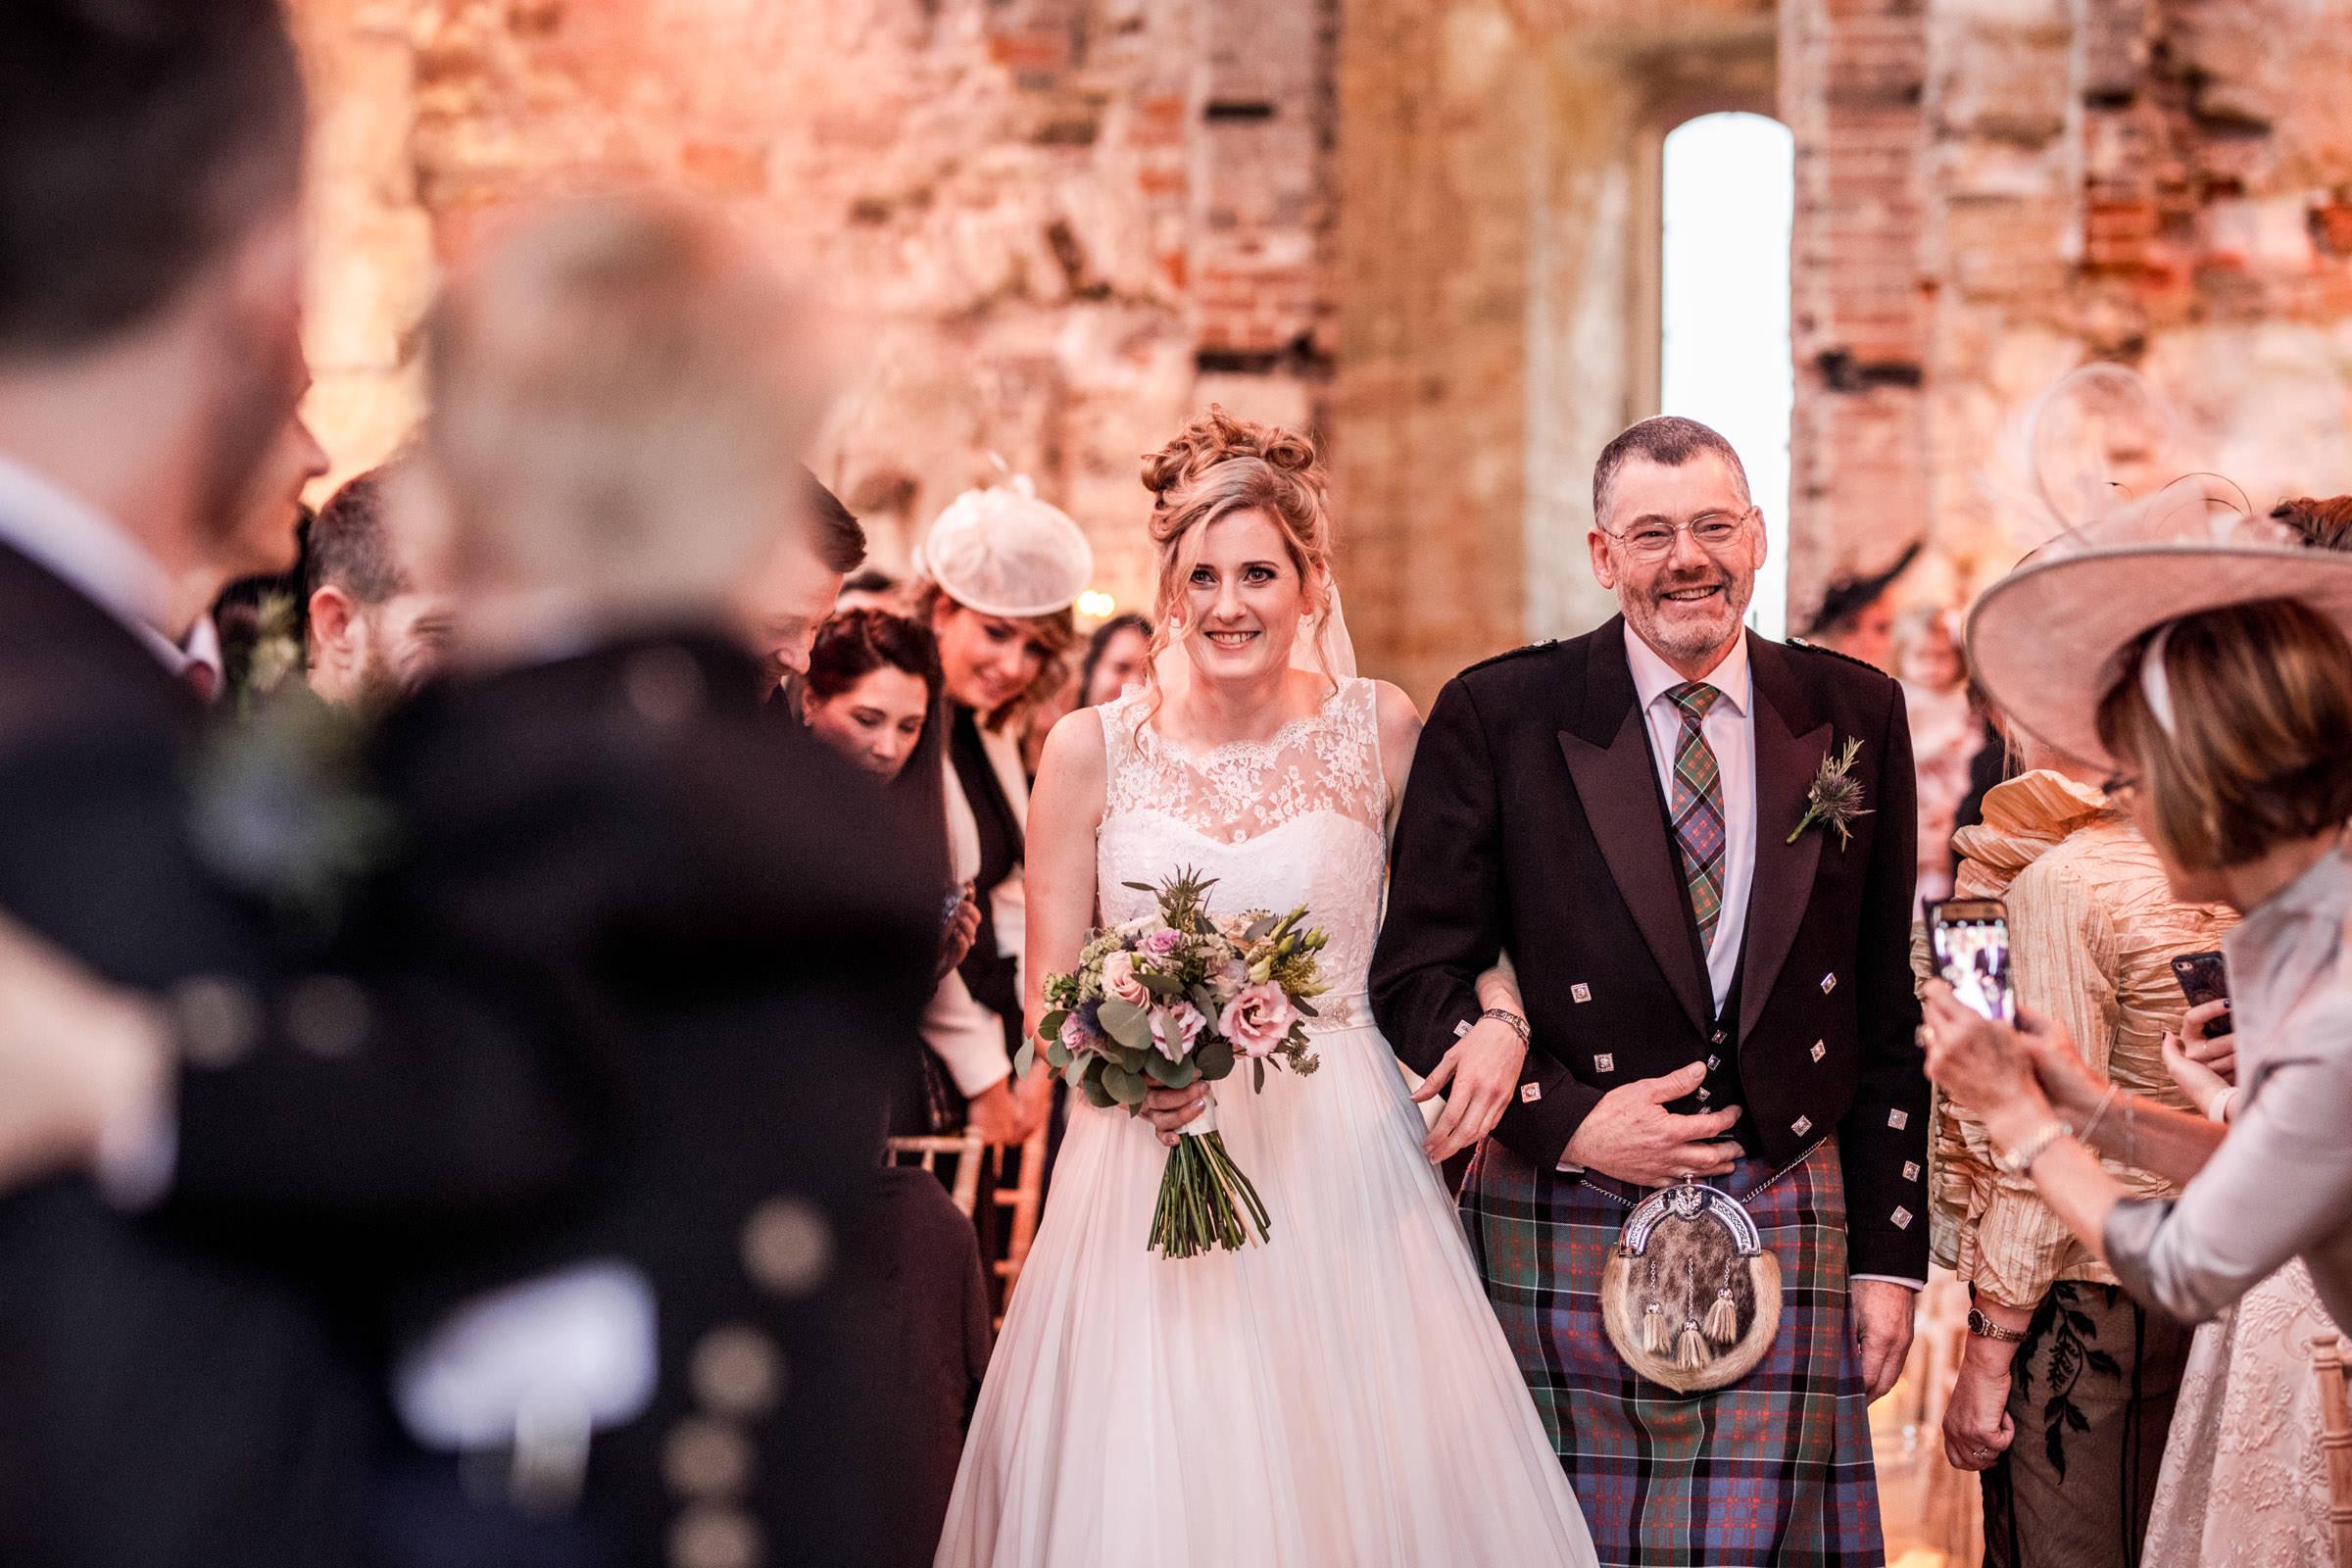 Lulworth Castle Wedding Photography 020.jpg